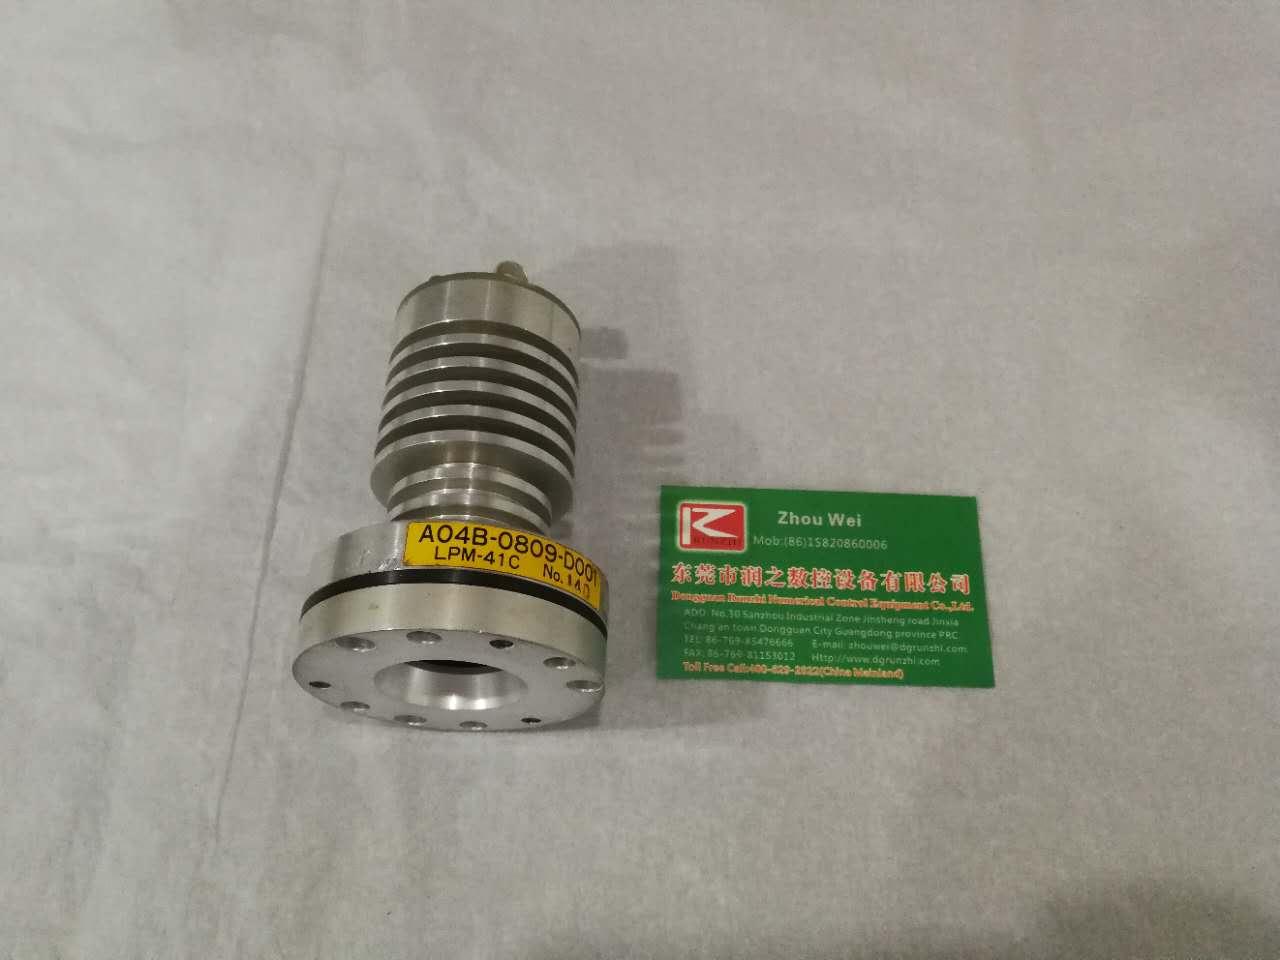 A04B-0809-D001-Fanuc Power Sensor for Fanuc co2 laser oscillator